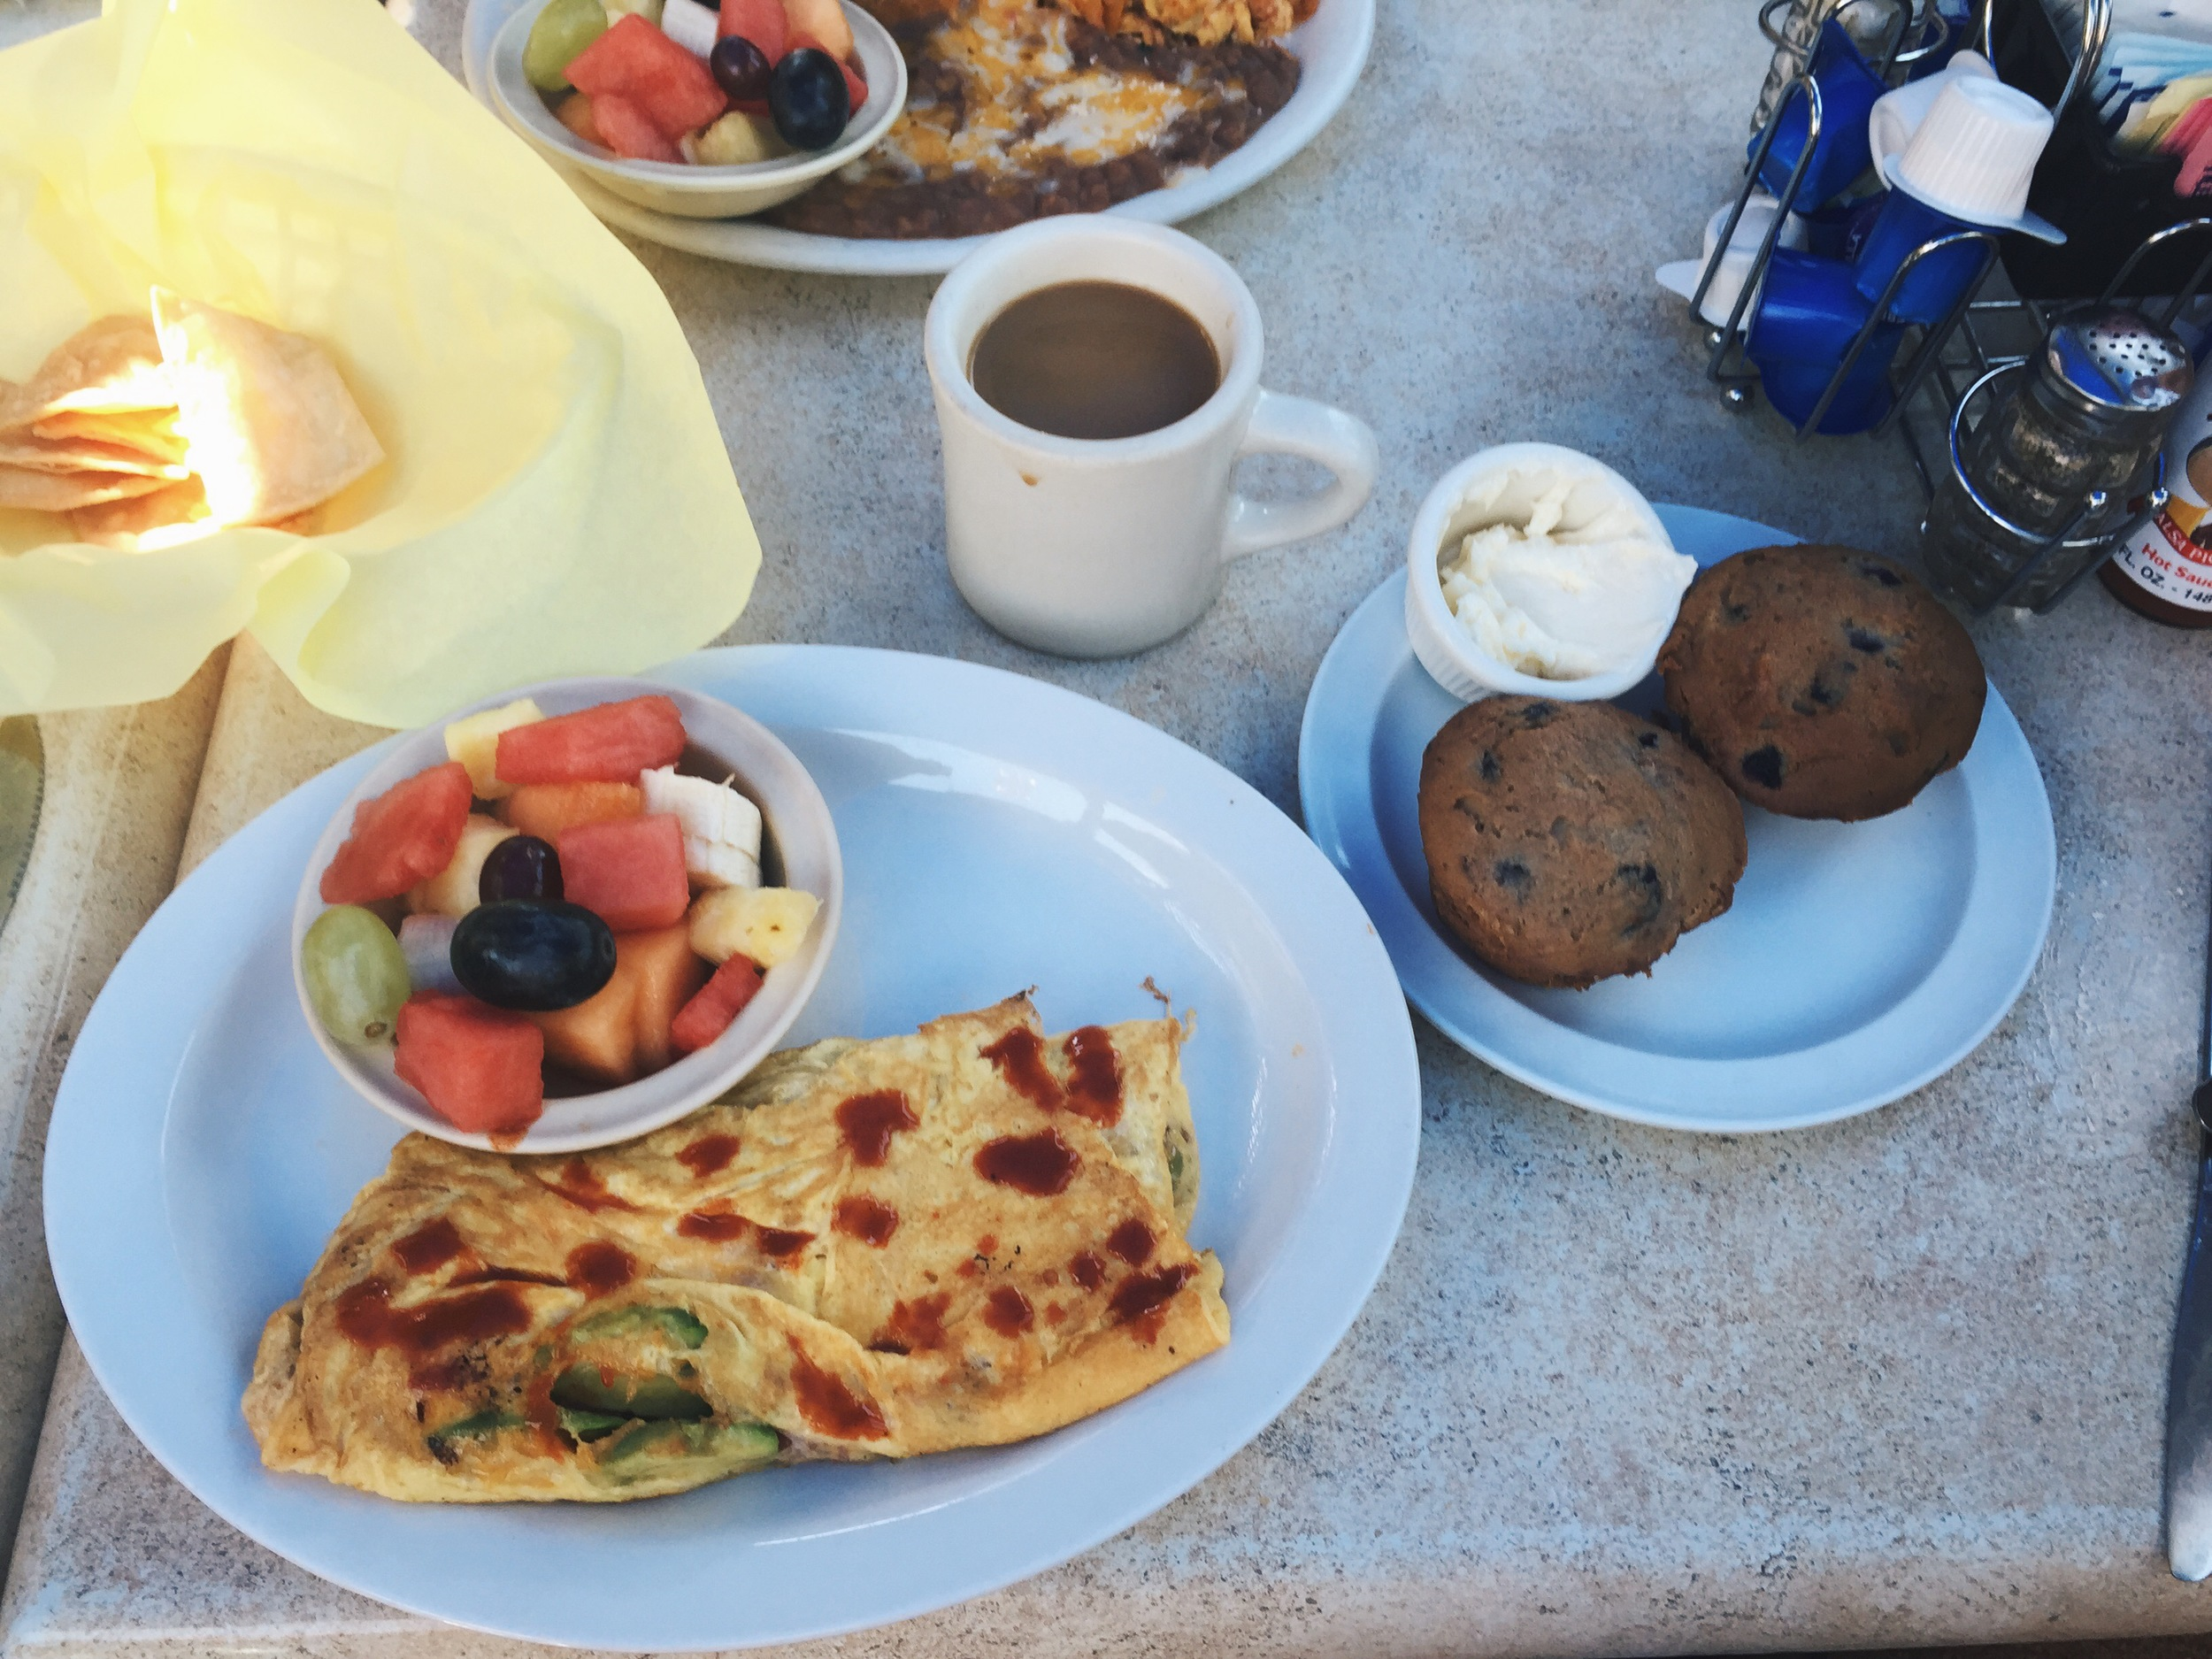 la playita - my favourite breakfast spot in hermosa beach, CA